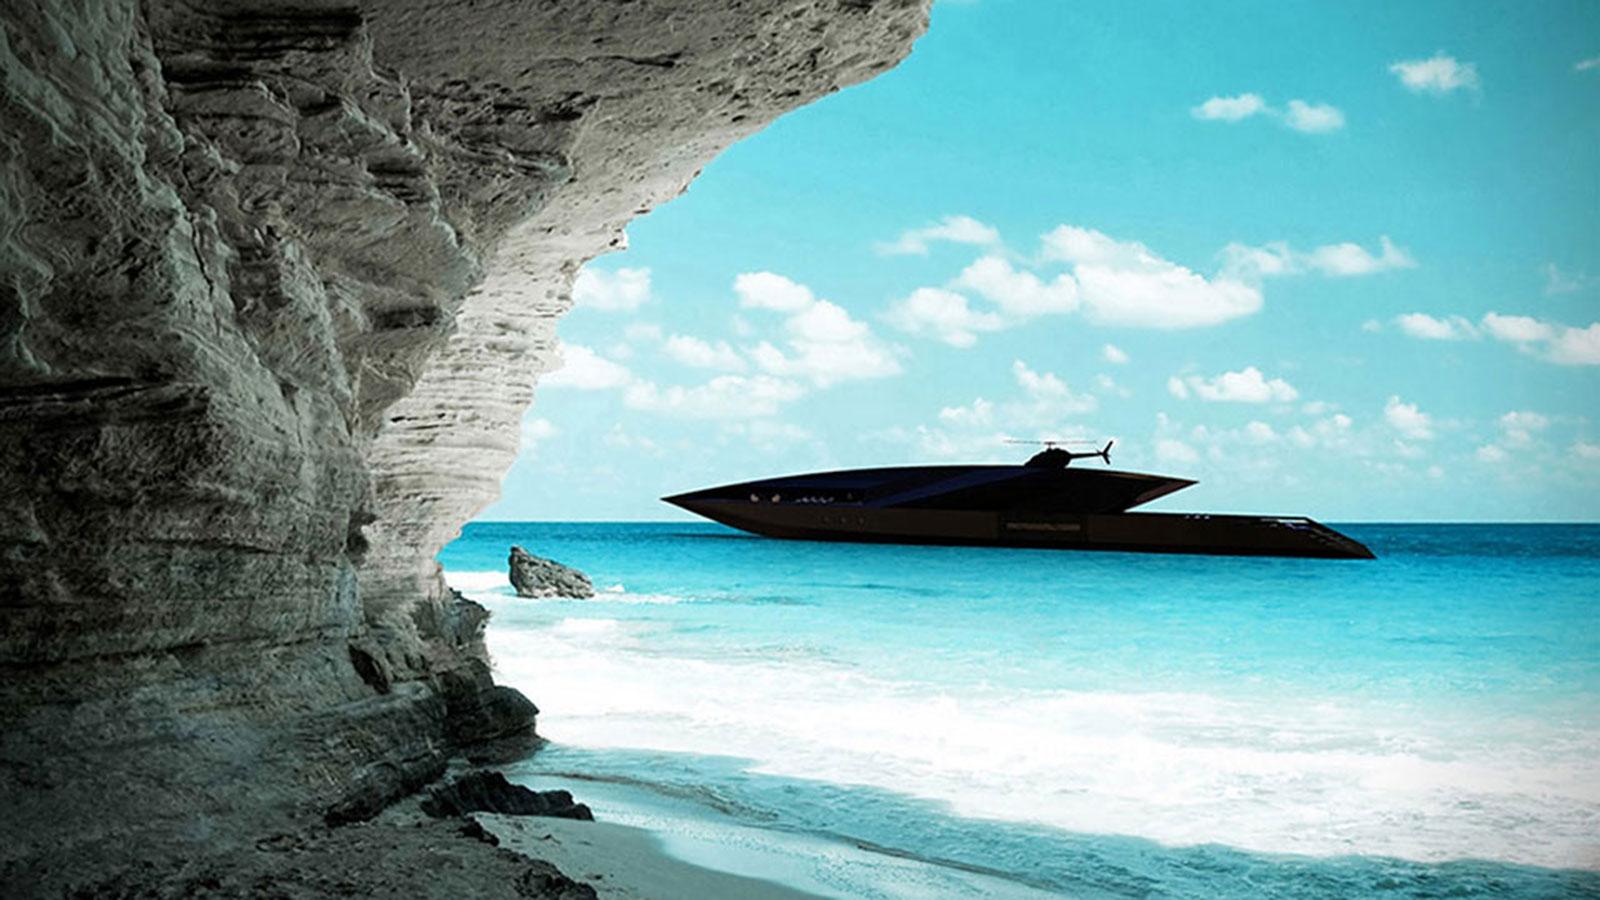 black-swan-superyacht-boat-04